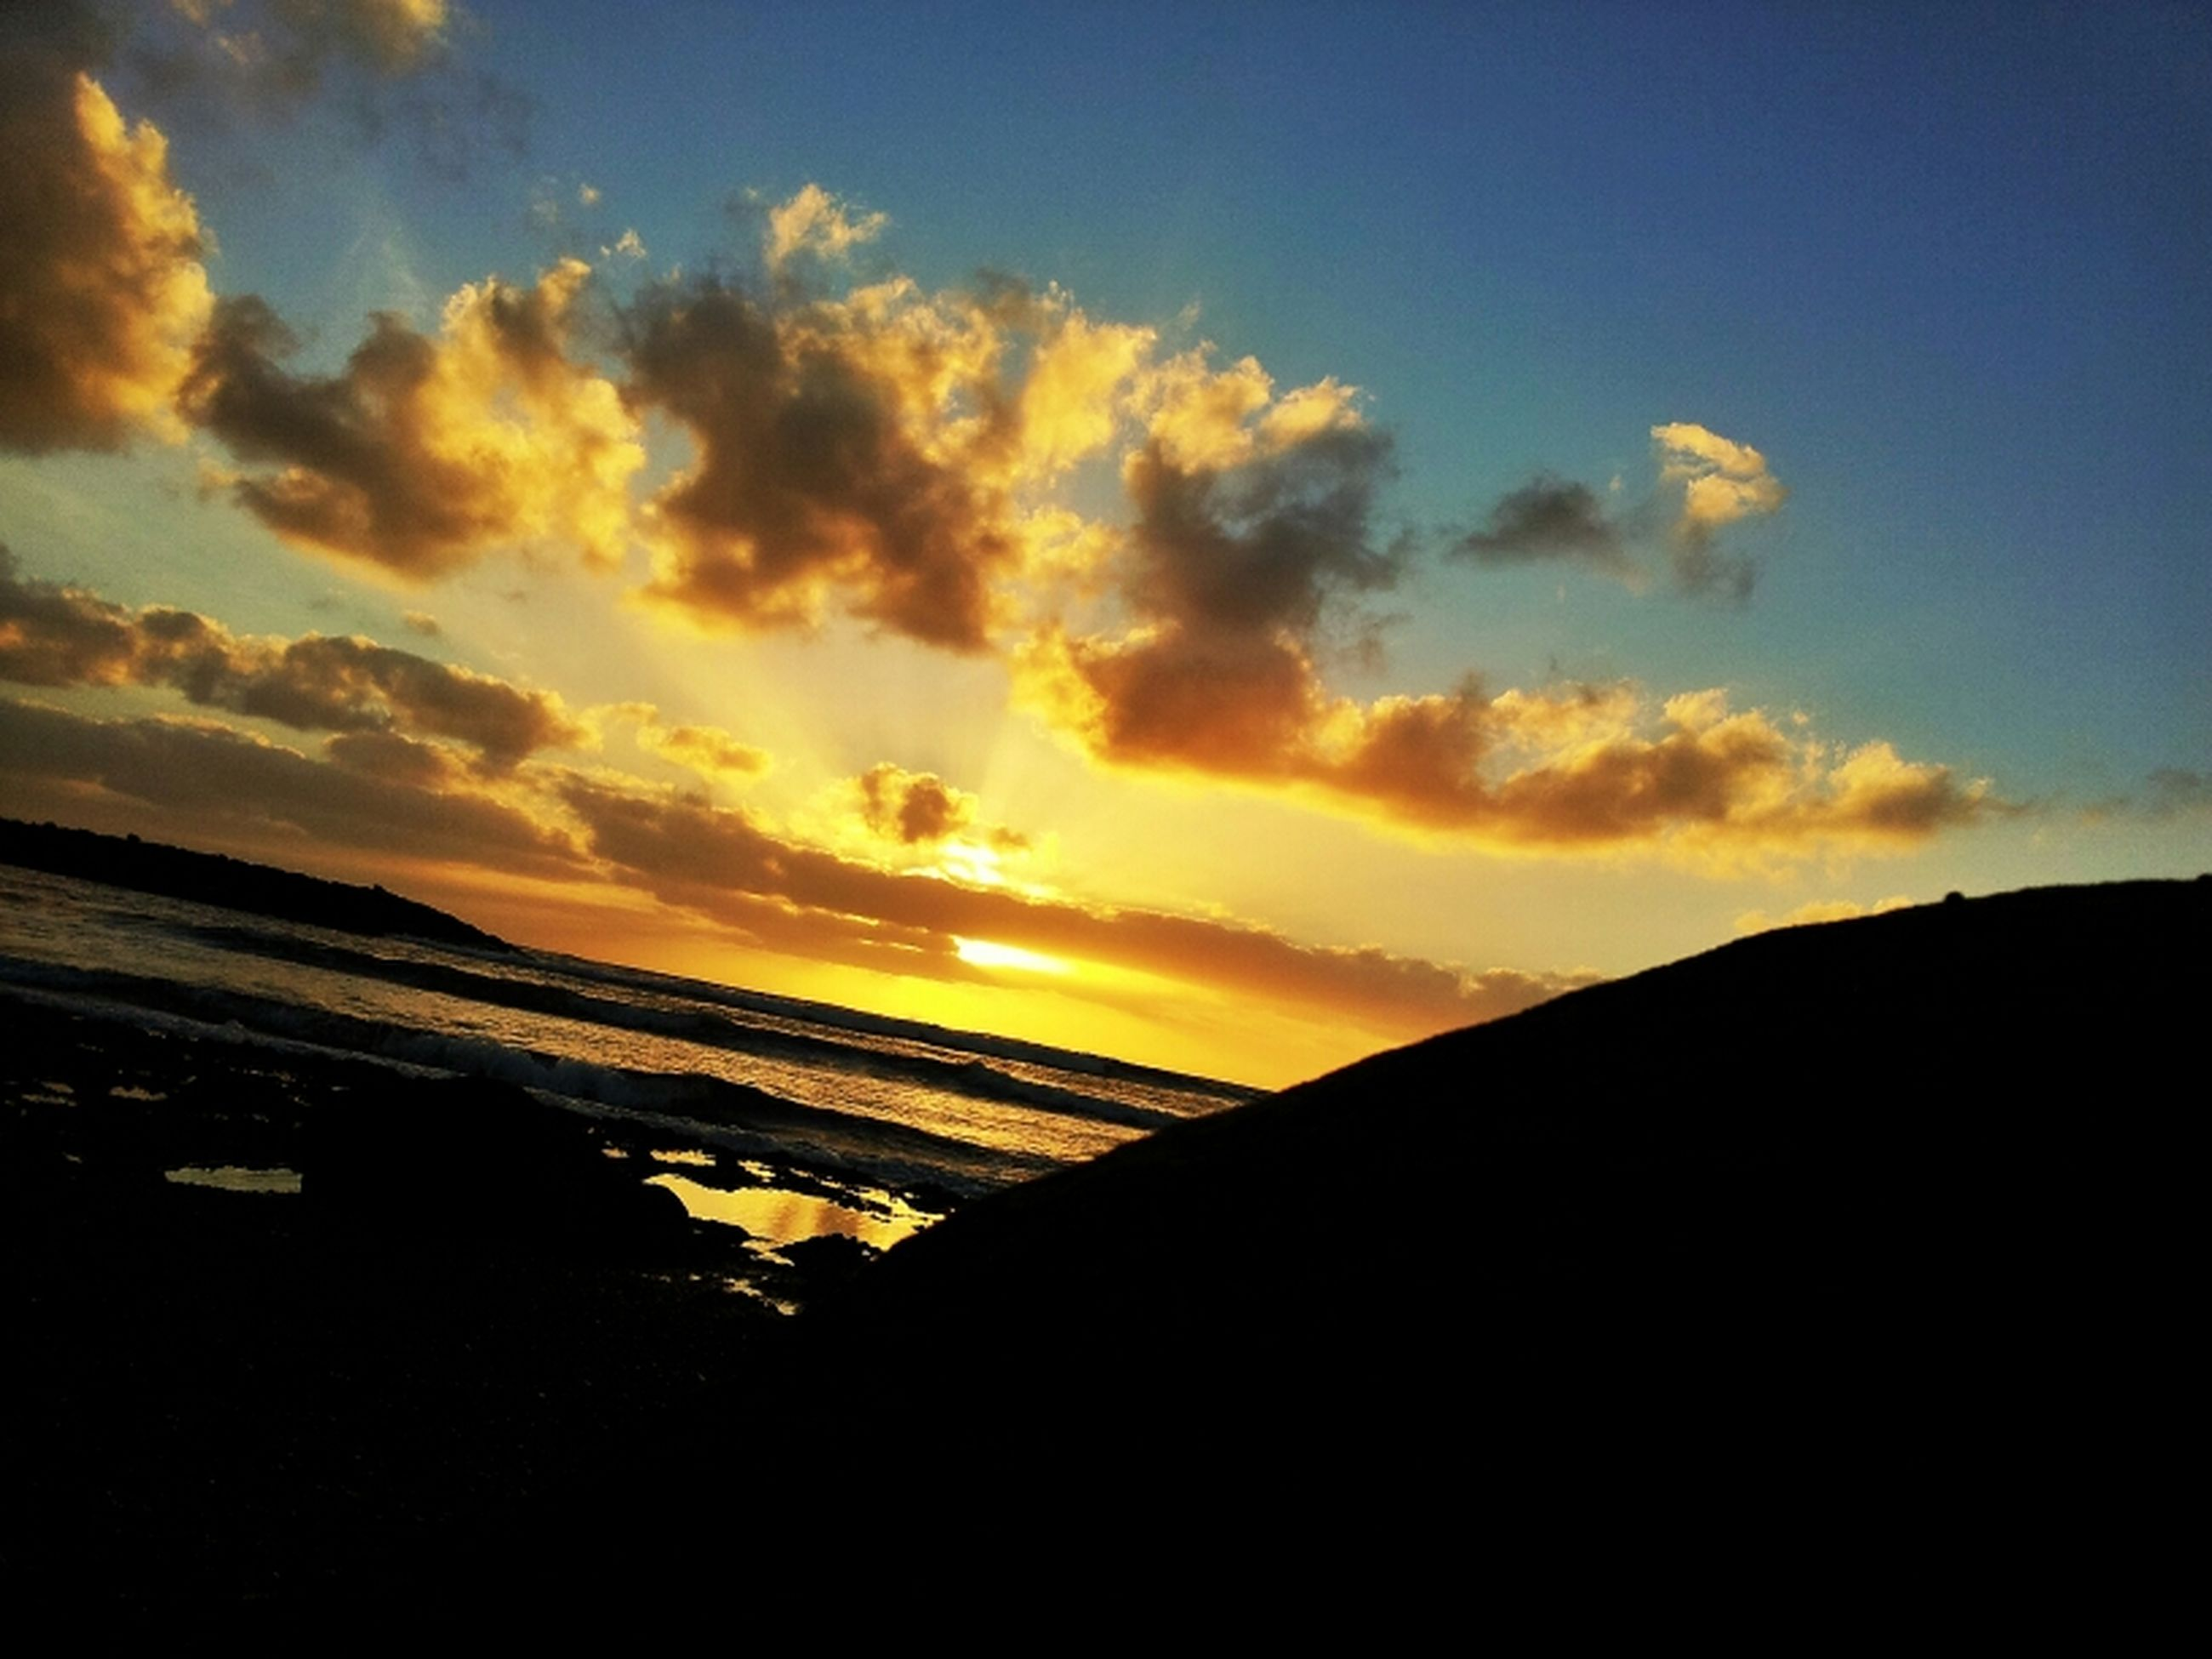 sunset, scenics, tranquil scene, sky, beauty in nature, tranquility, water, sea, orange color, sun, silhouette, idyllic, cloud - sky, horizon over water, nature, cloud, shore, beach, sunlight, outdoors